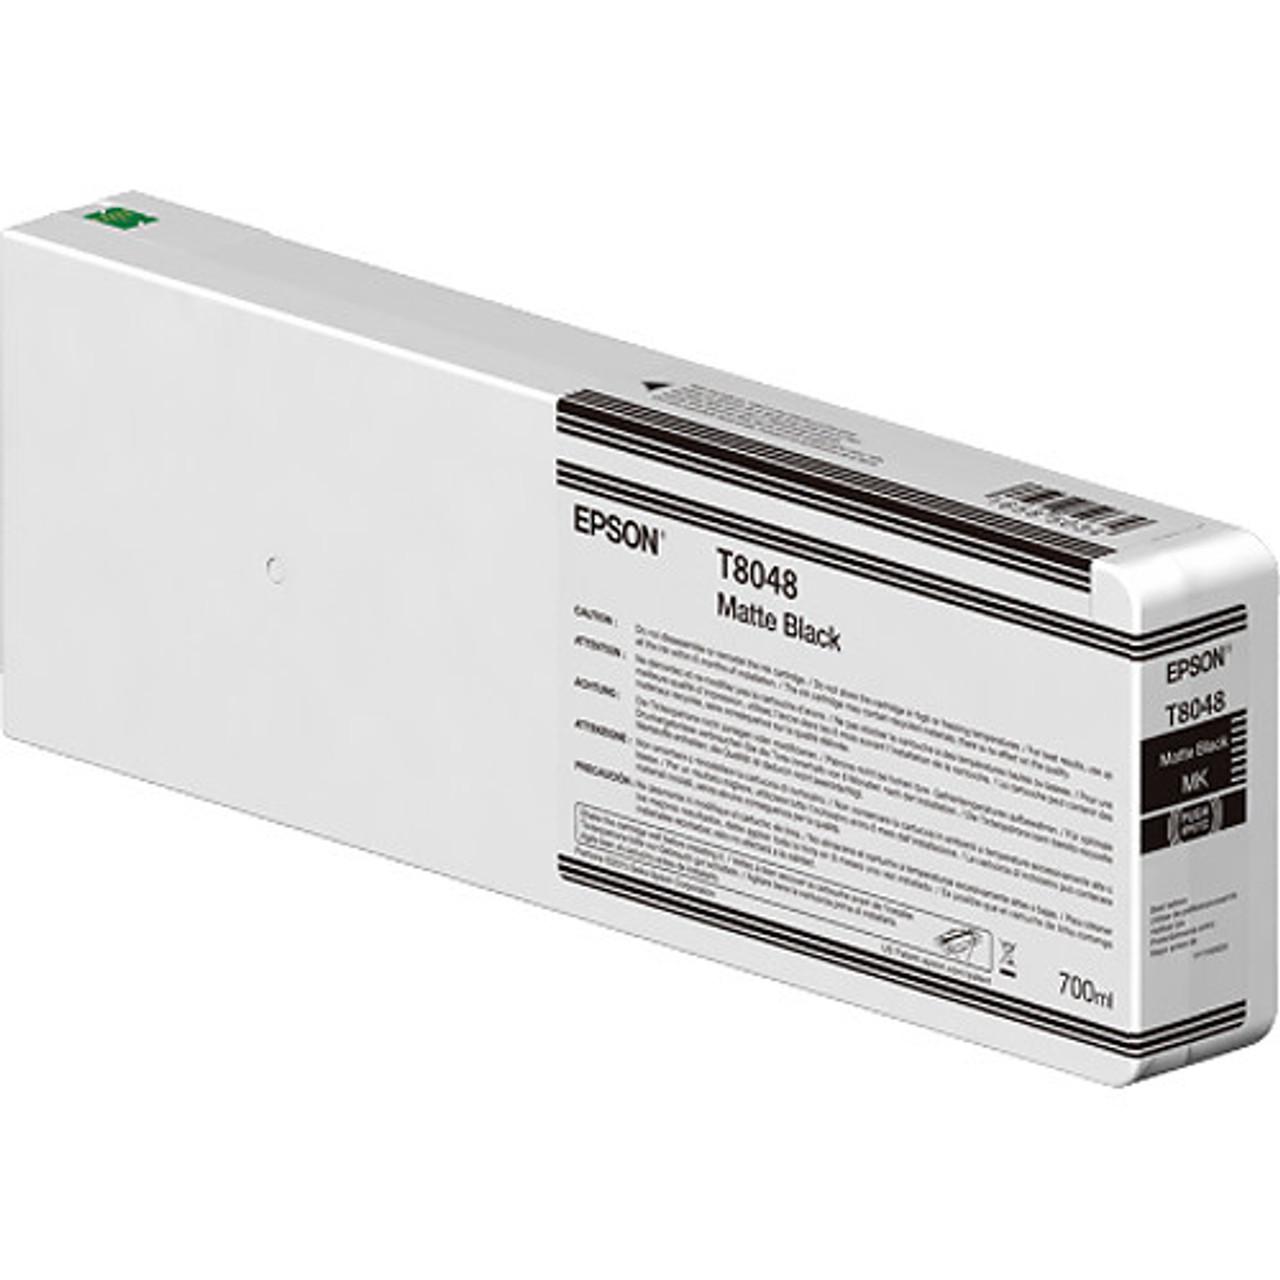 Epson T804800 Matte Black Ink Cartridge, 700 mL